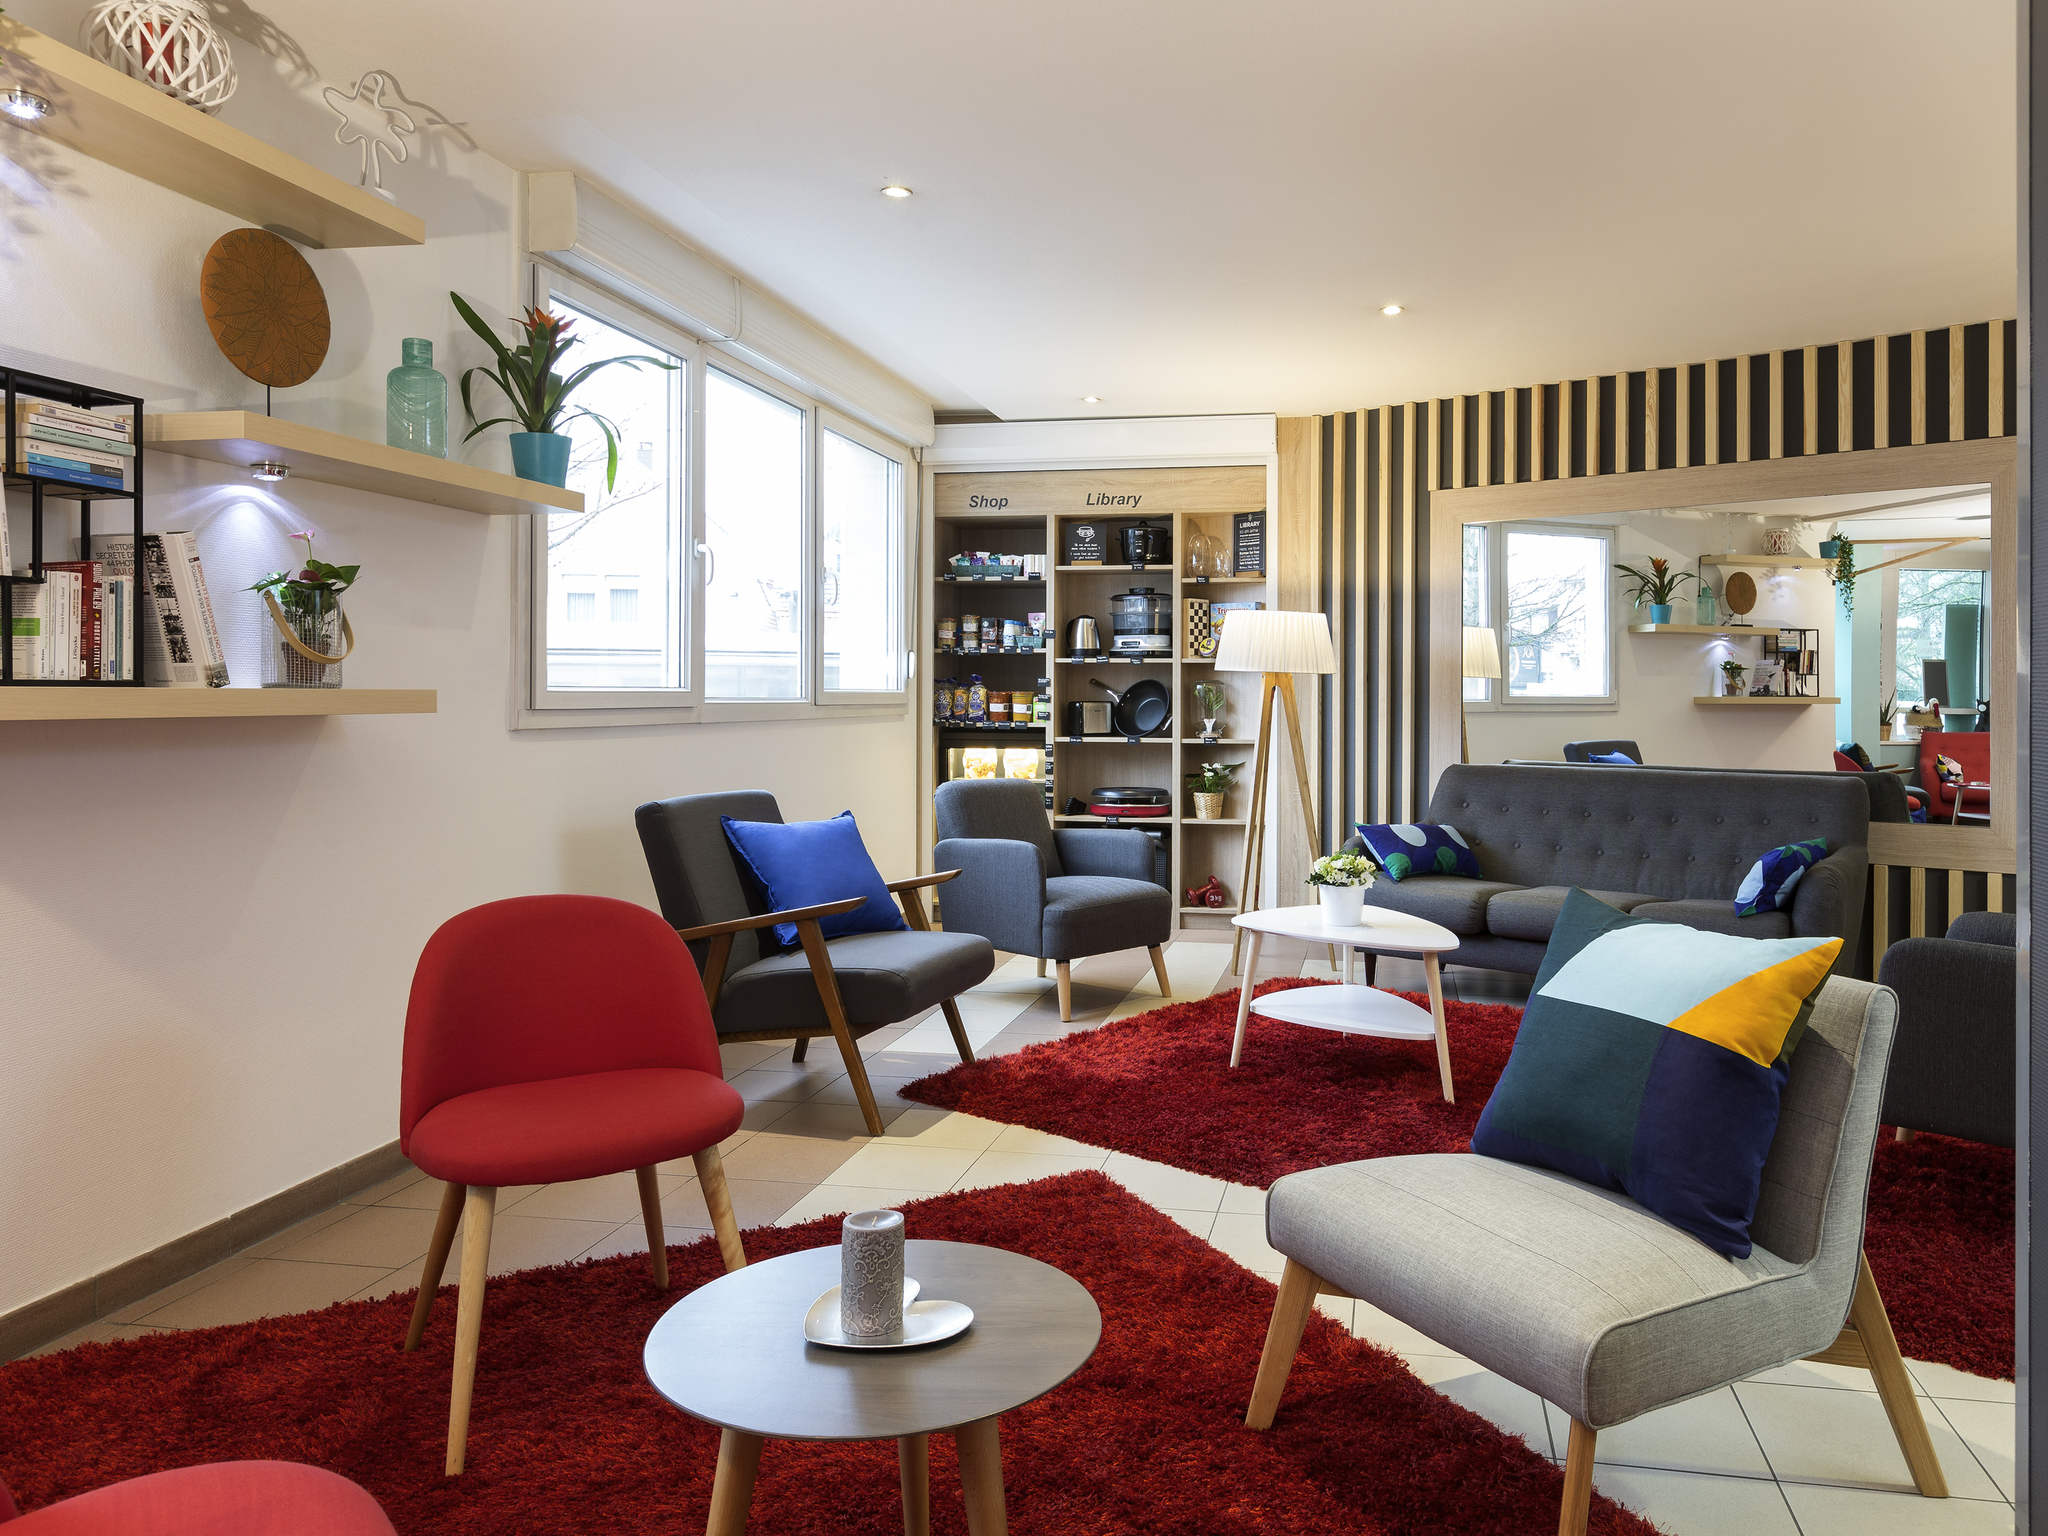 Hôtel - Aparthotel Adagio access Strasbourg Illkirch